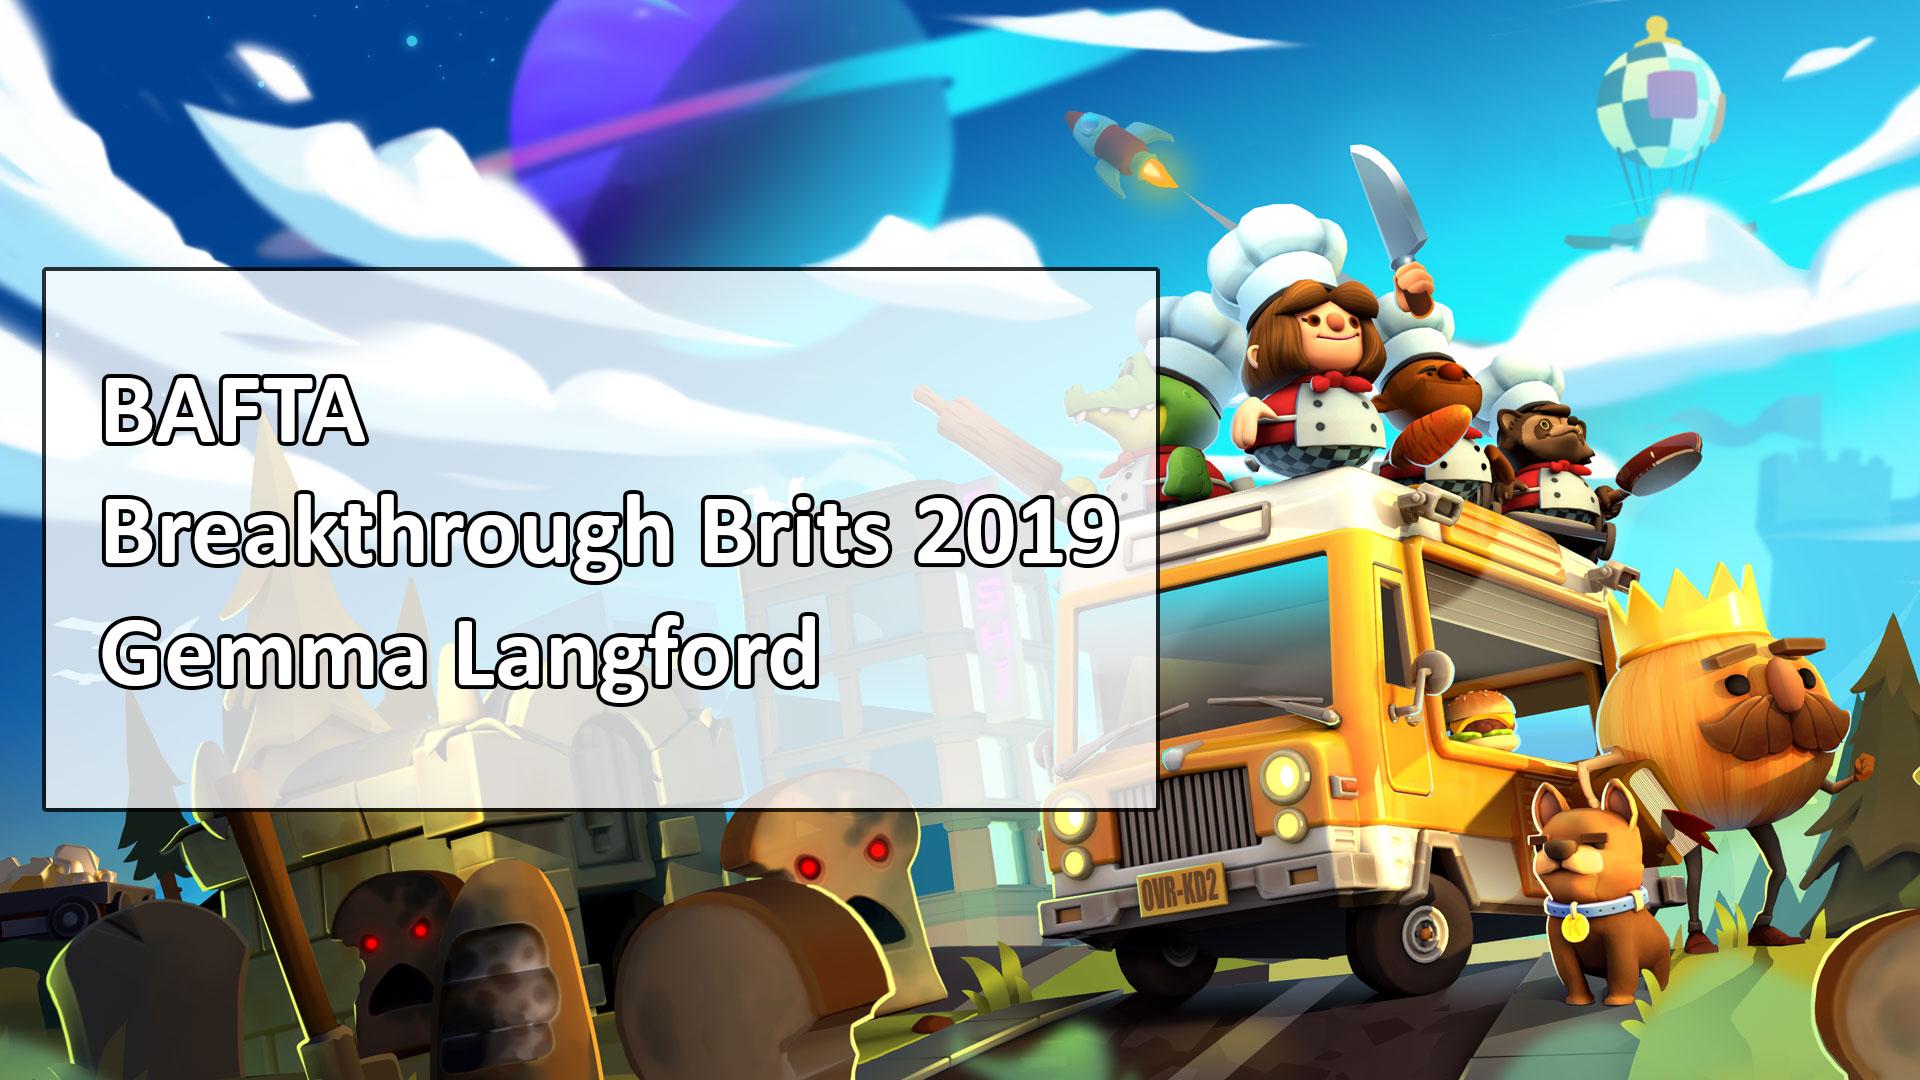 BAFTA Breakthrough Brits 2019 – Gemma Langford!